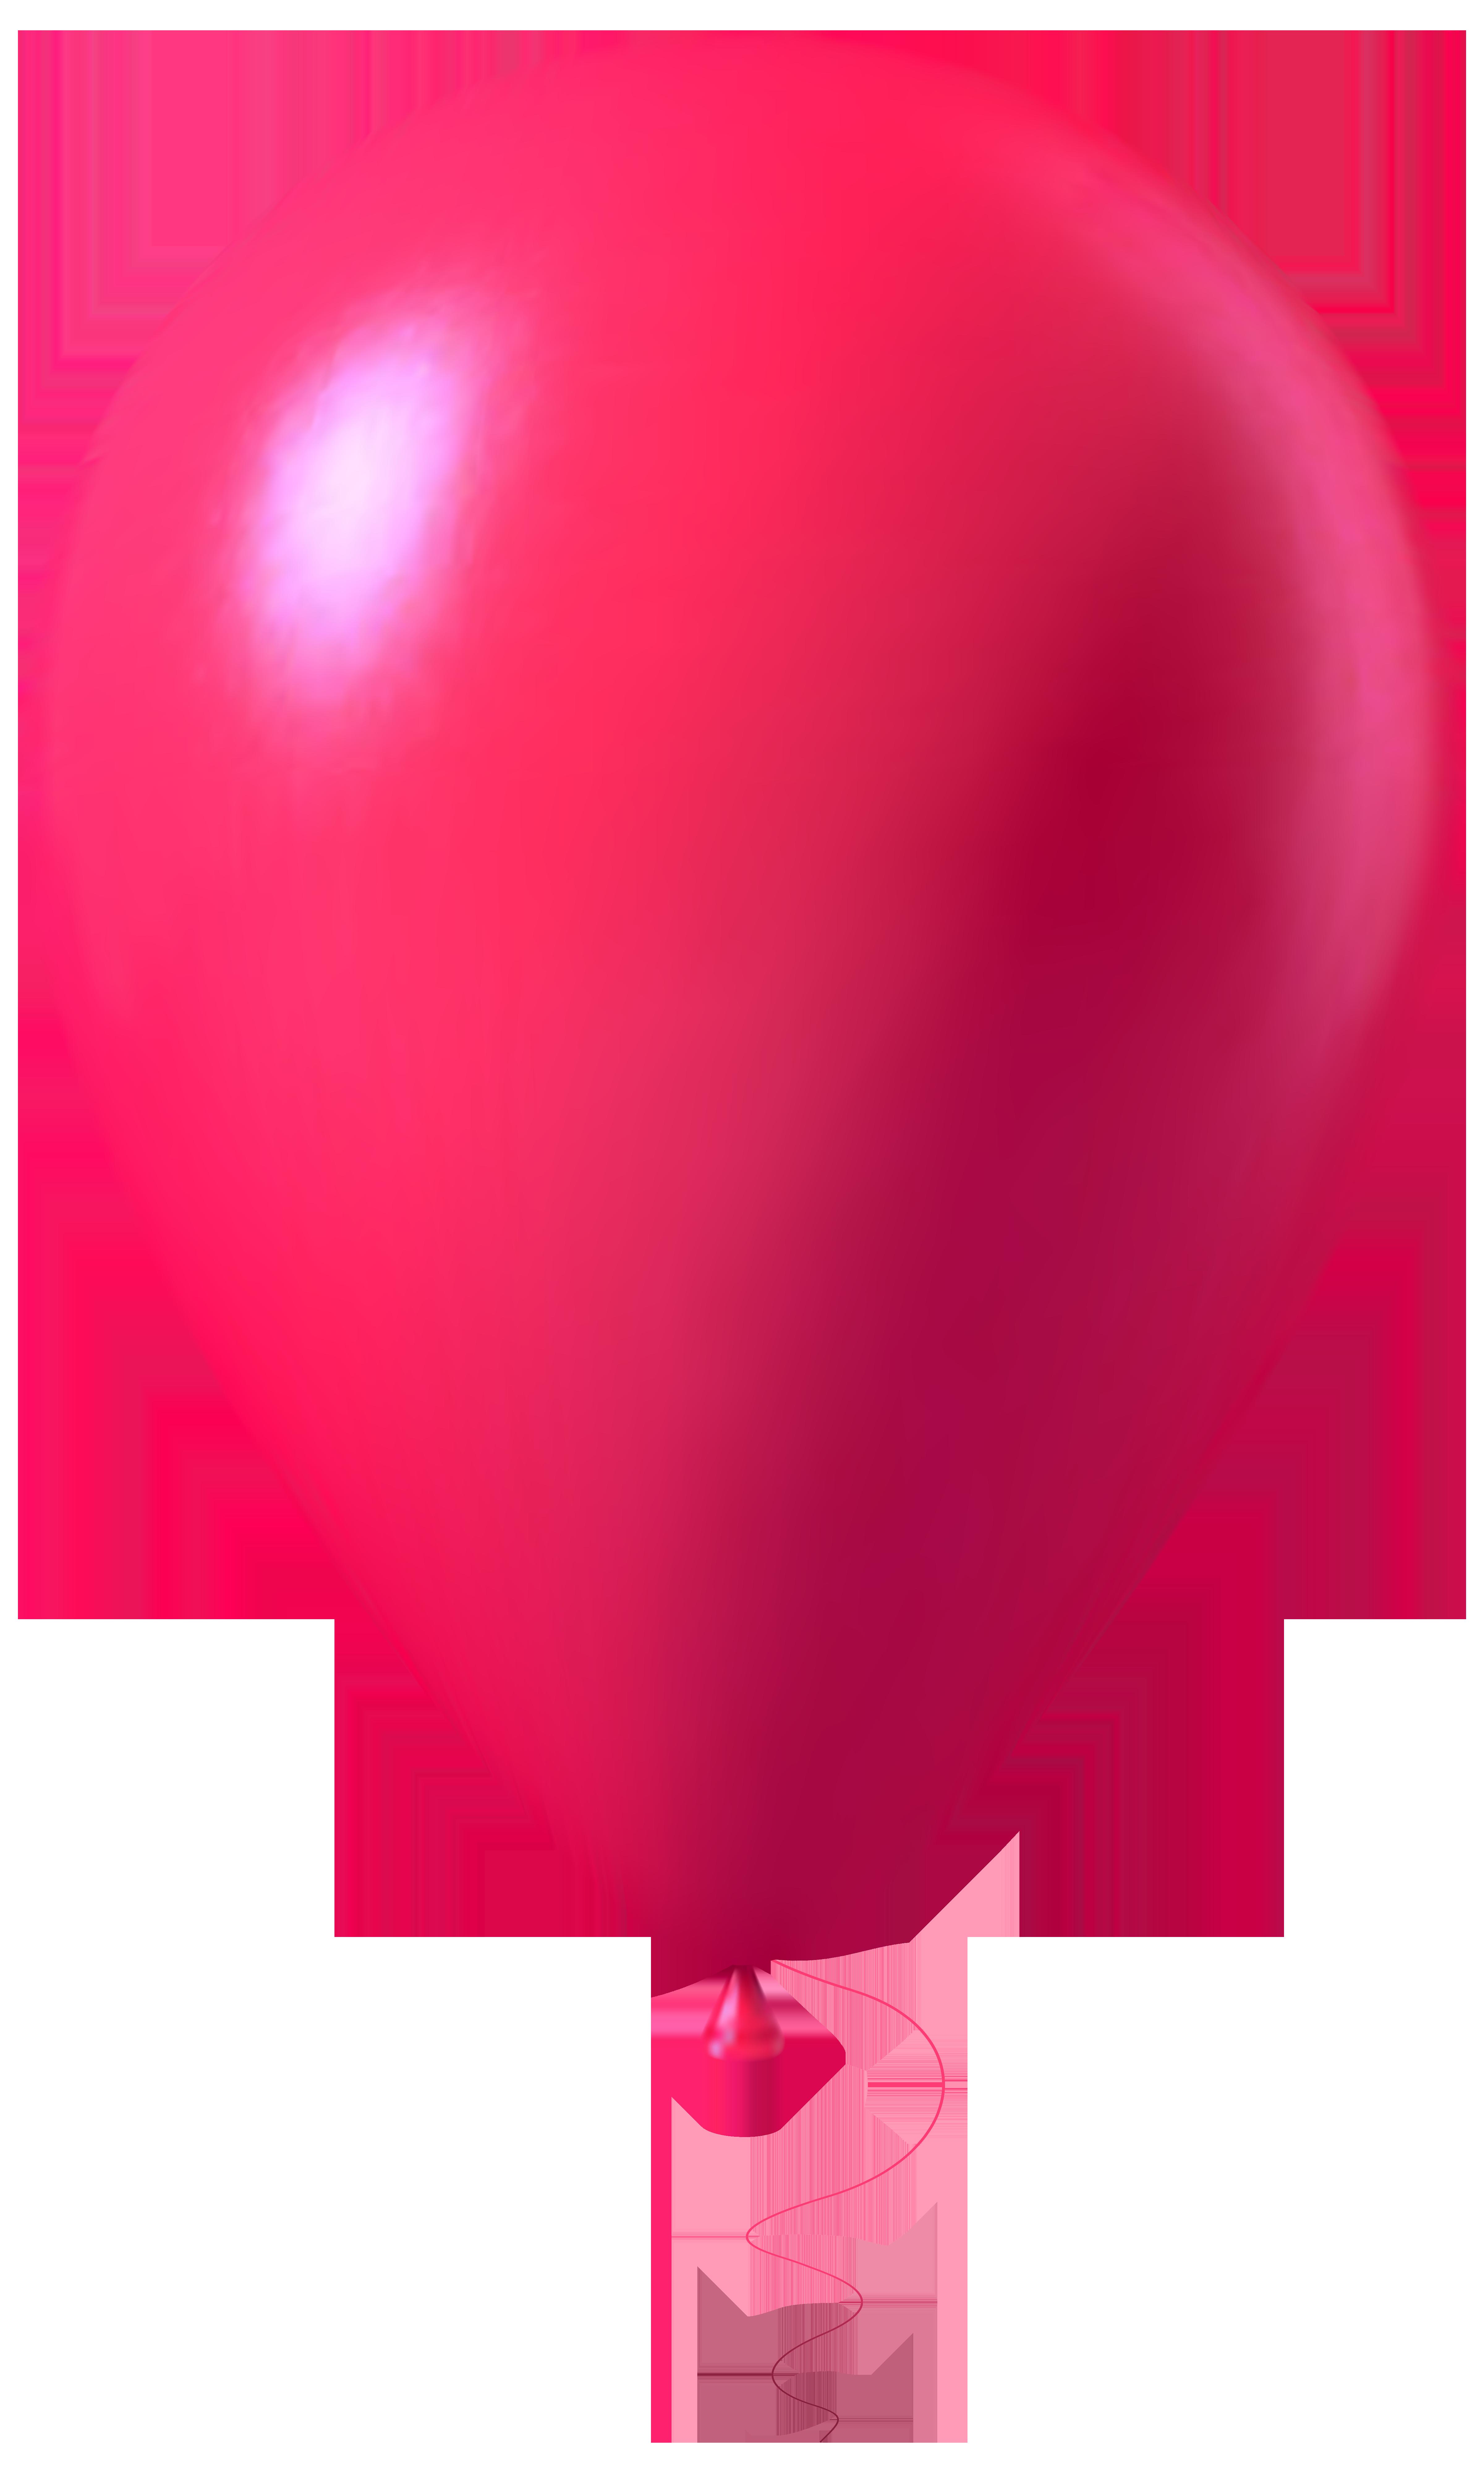 Clipart balloon cupcake. Pink transparent png image